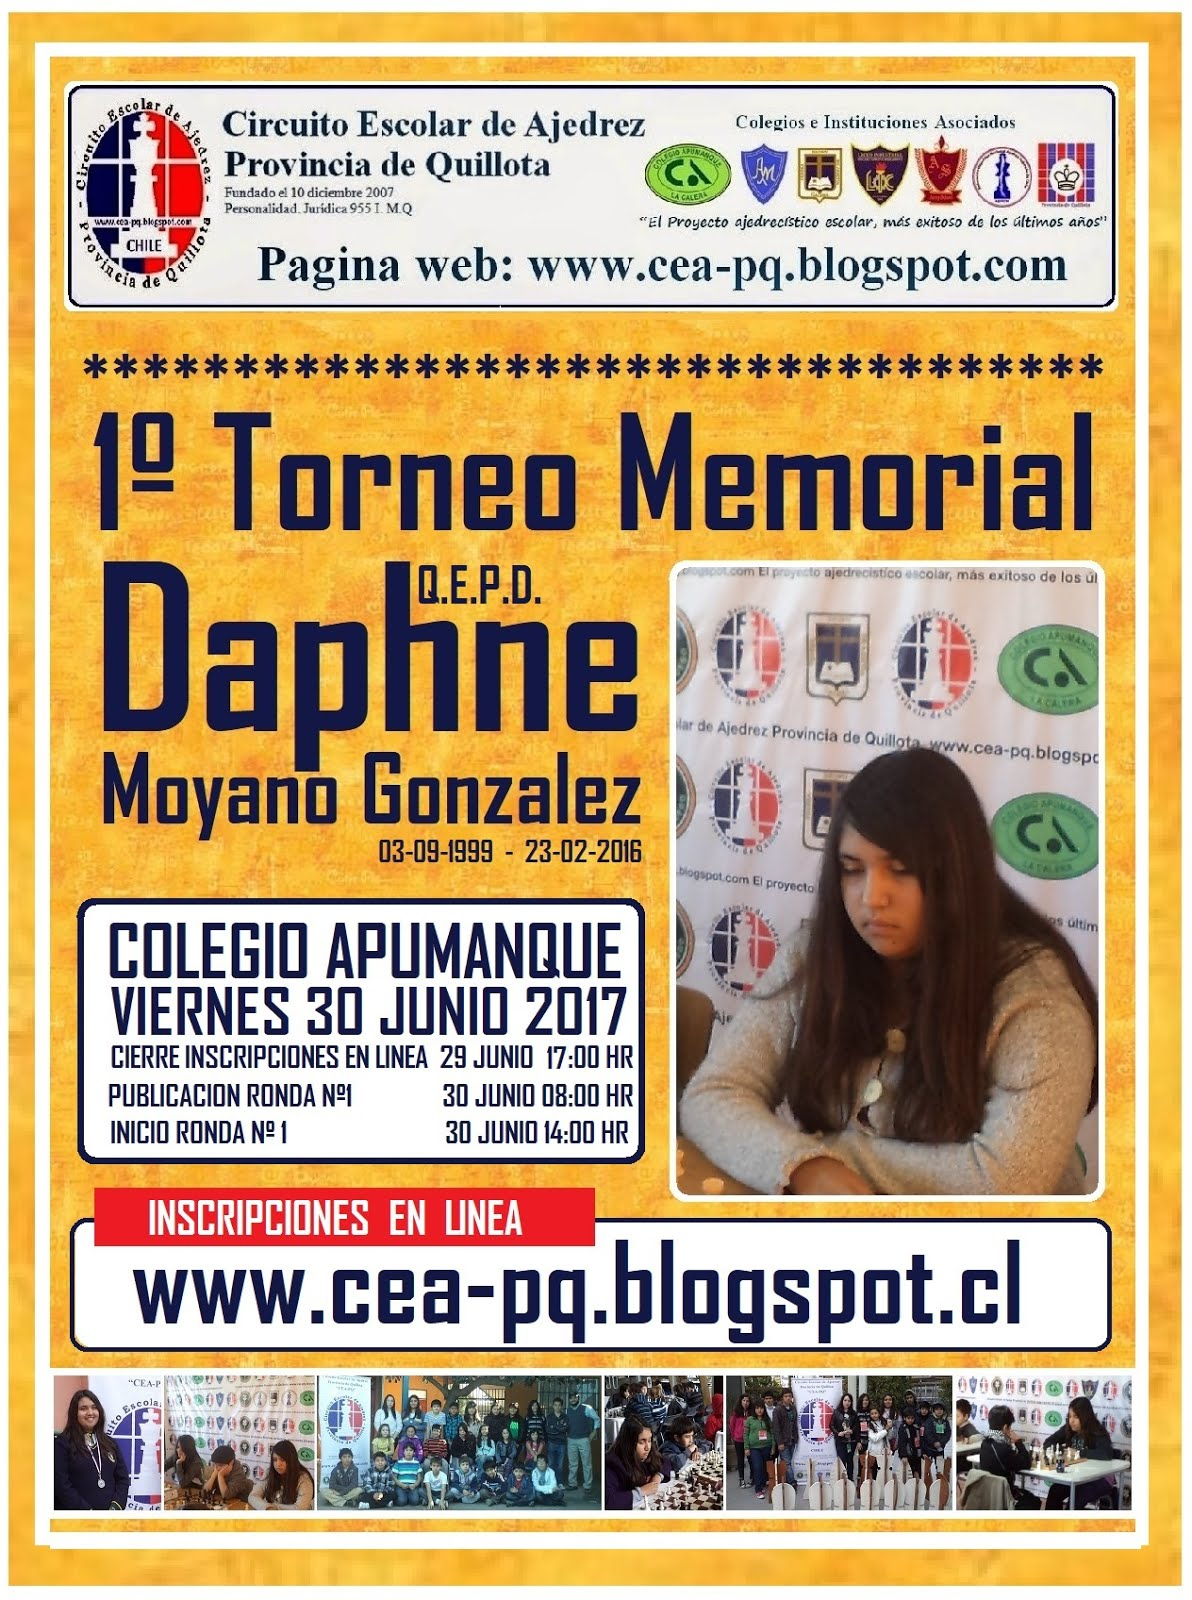 1º TORNEO MEMORIAL DAPHNE MOYANO GONZALEZ